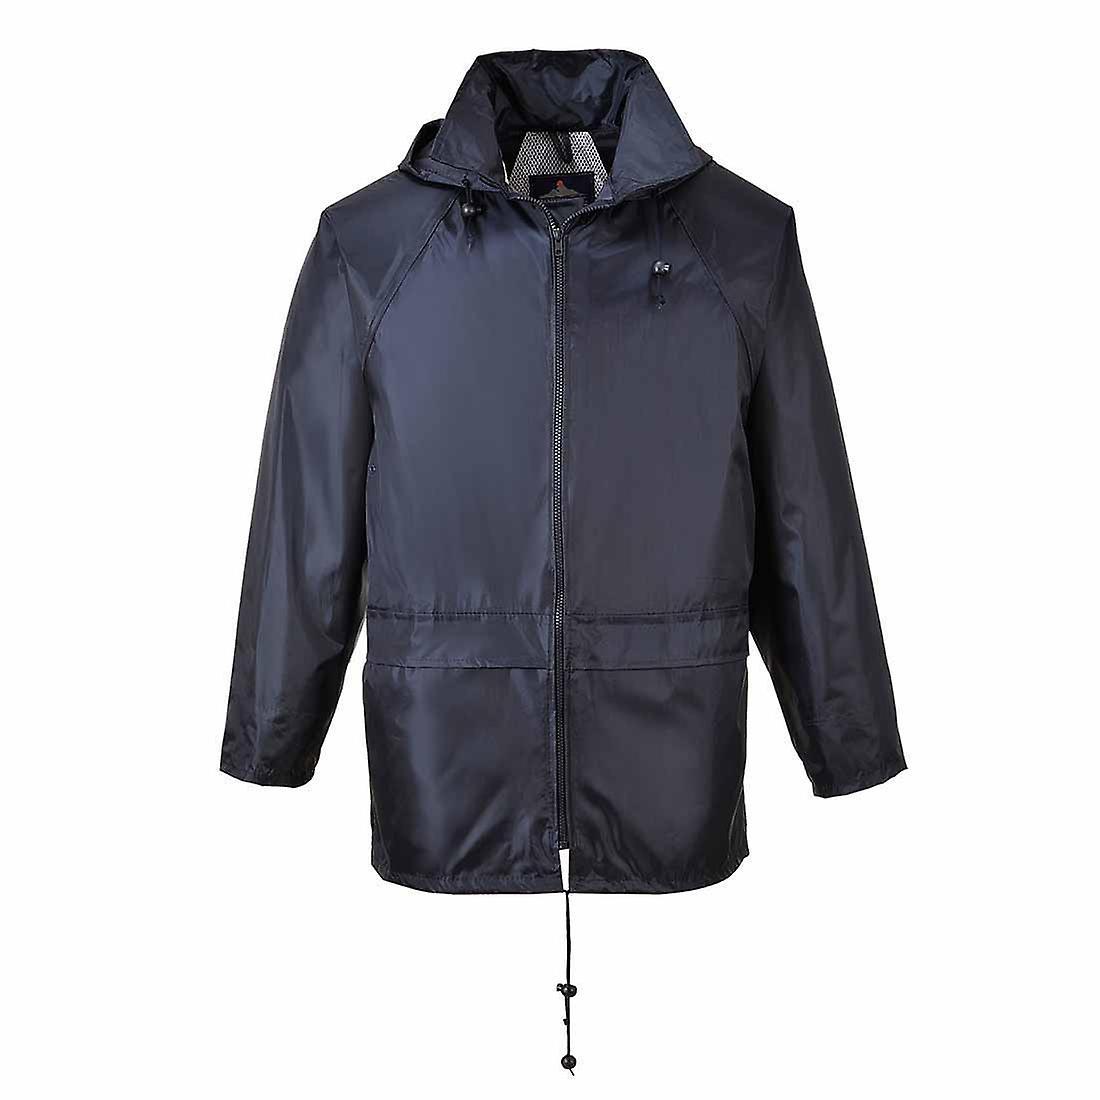 Portwest - Classic Workwear Safety Rain Jacket